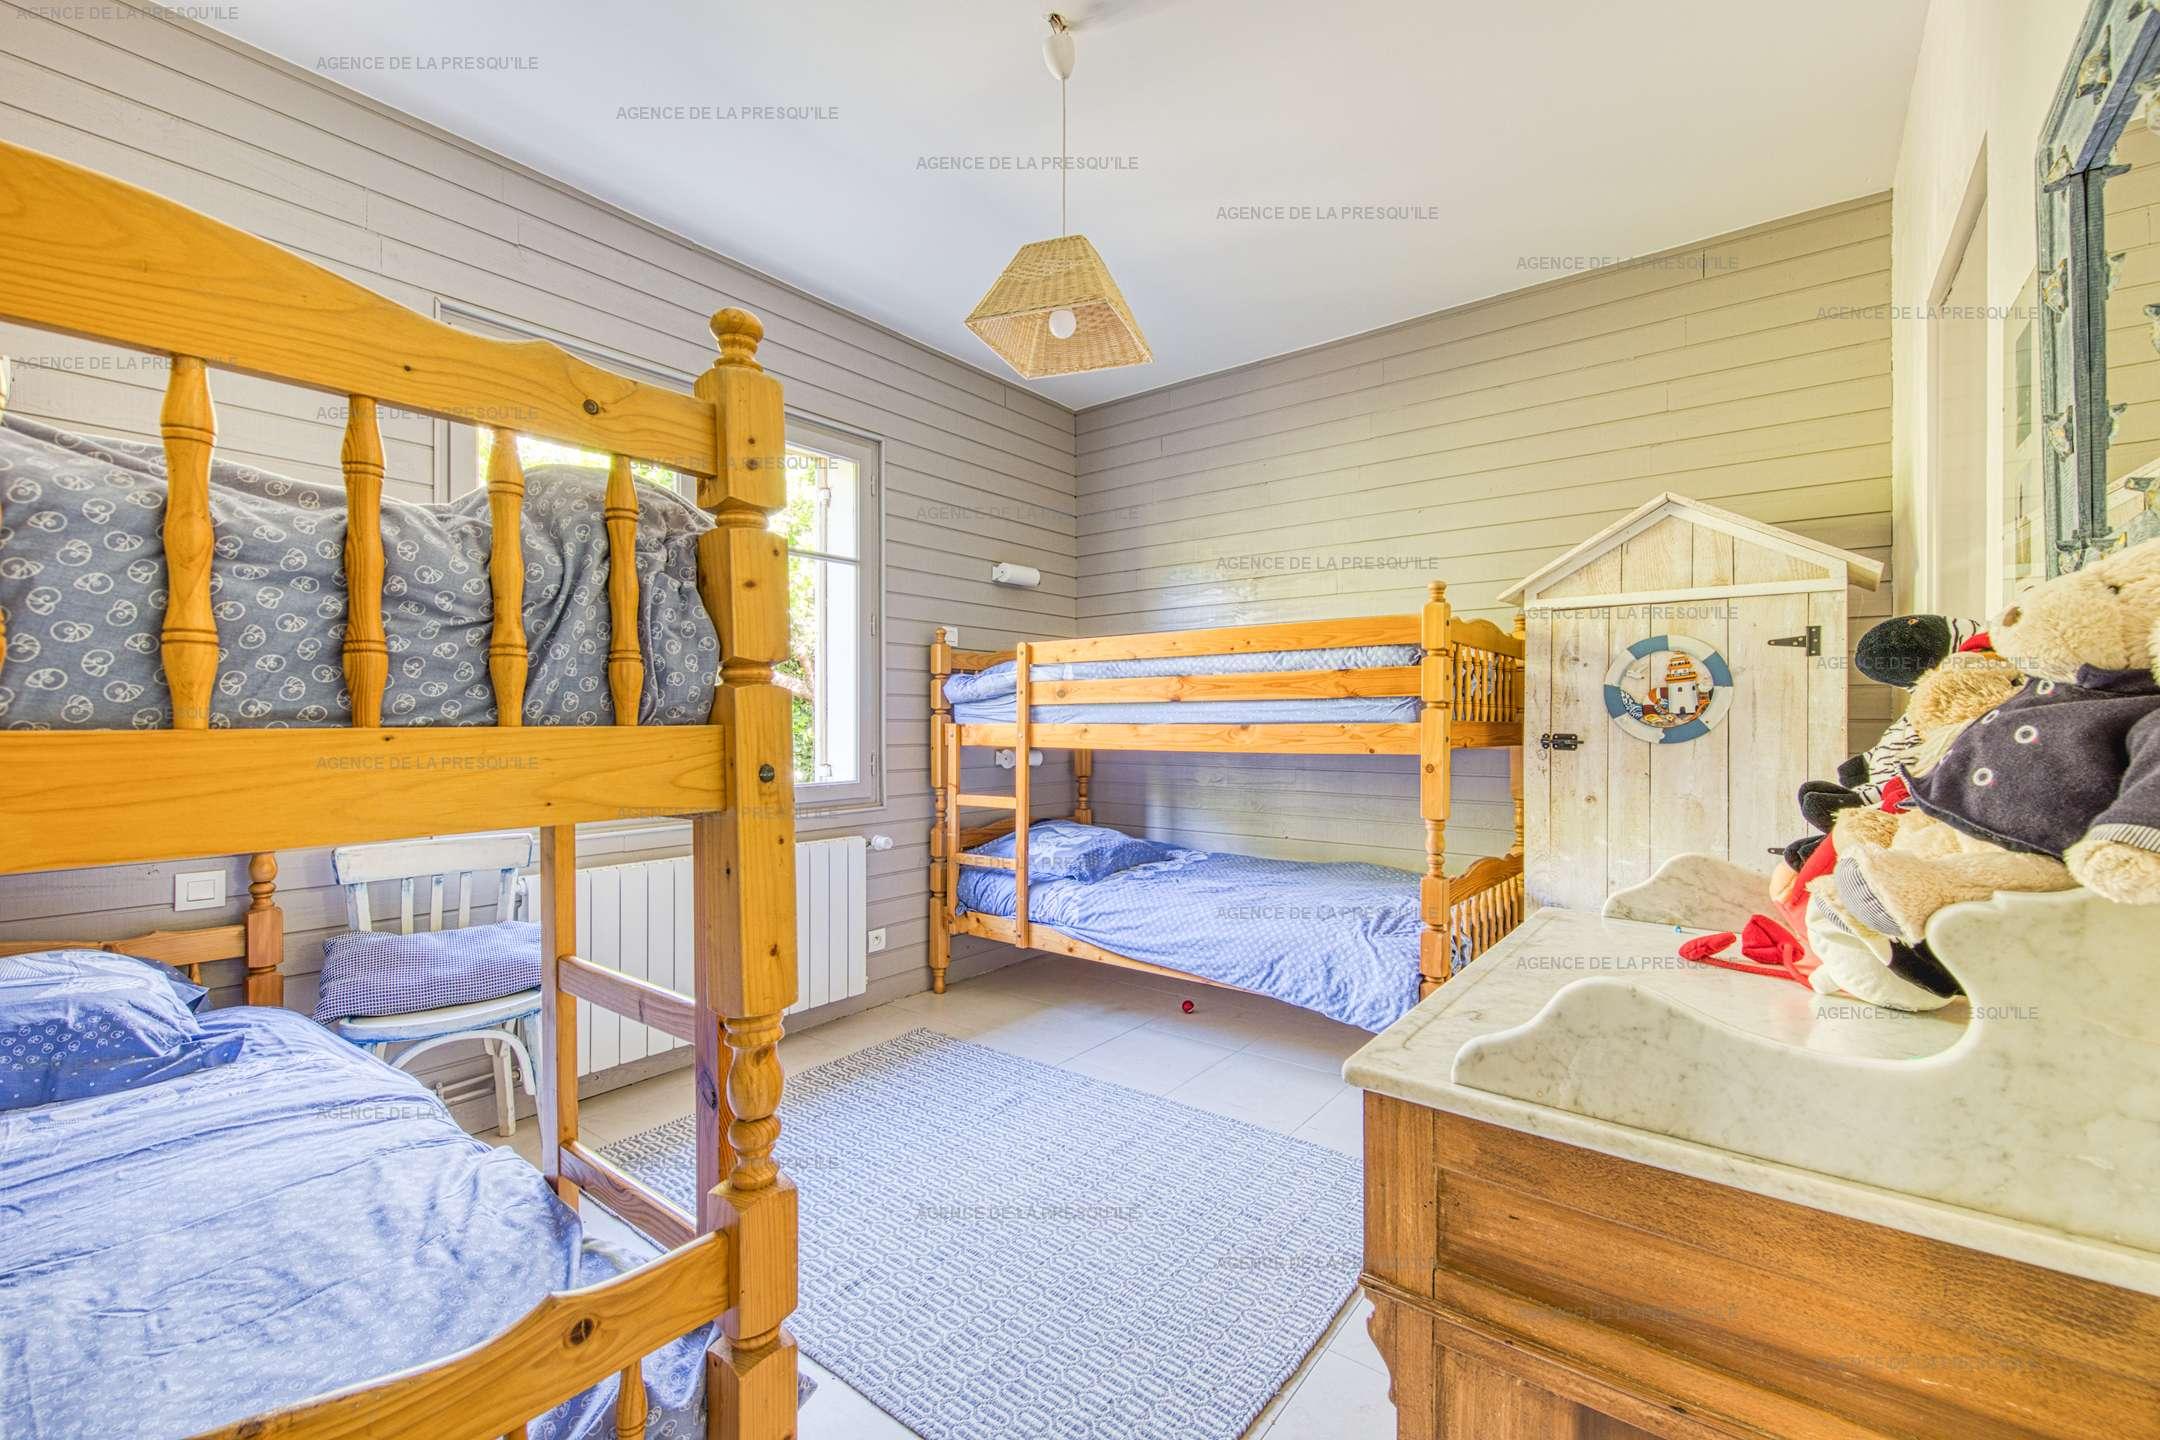 Location: Charmante villa avec piscine entre bassin et océan 12